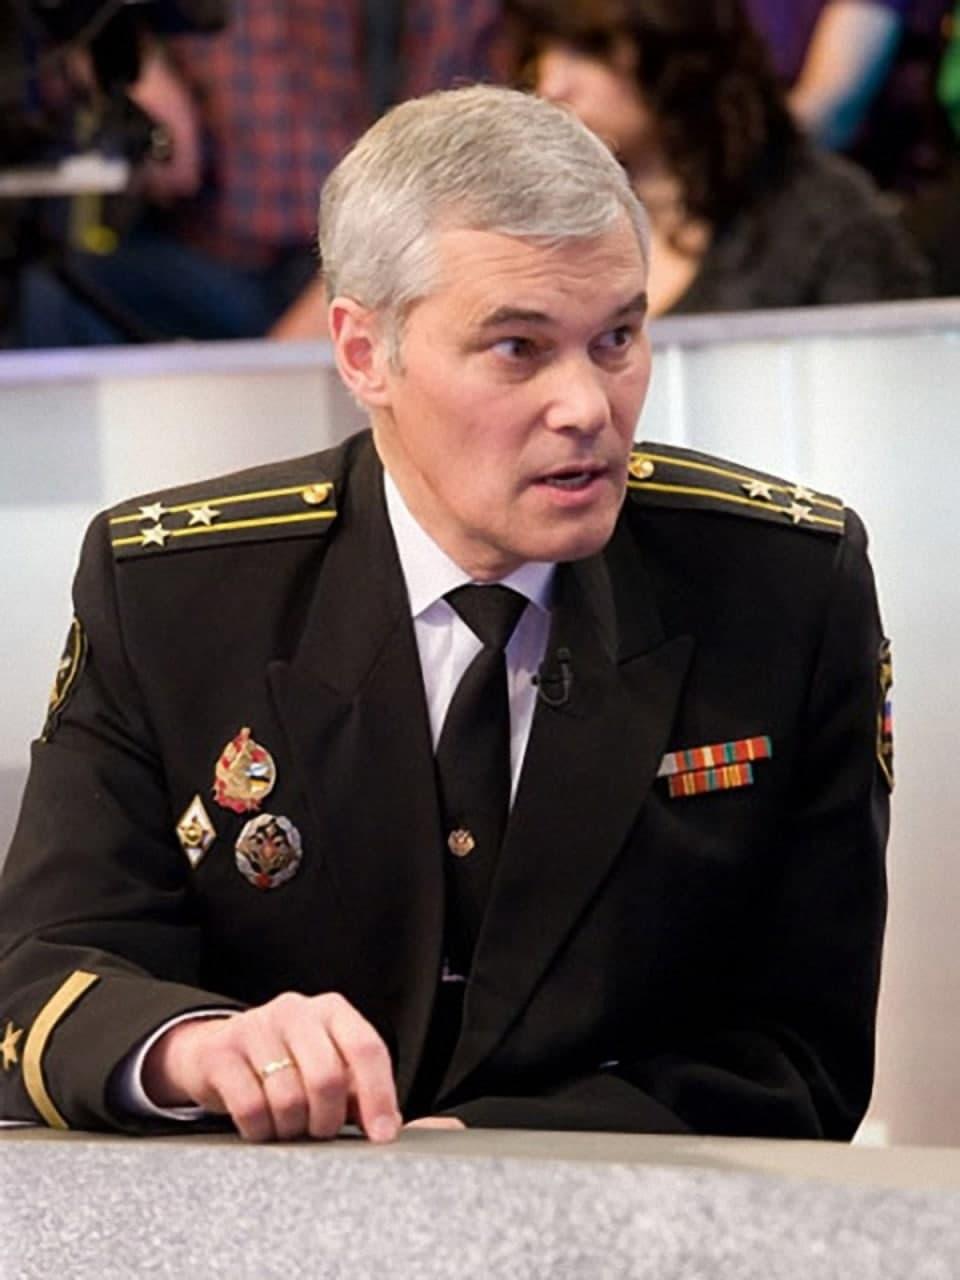 Константин Сивков: «Давление на Россию усилят, но не при помощи Талибана» геополитика